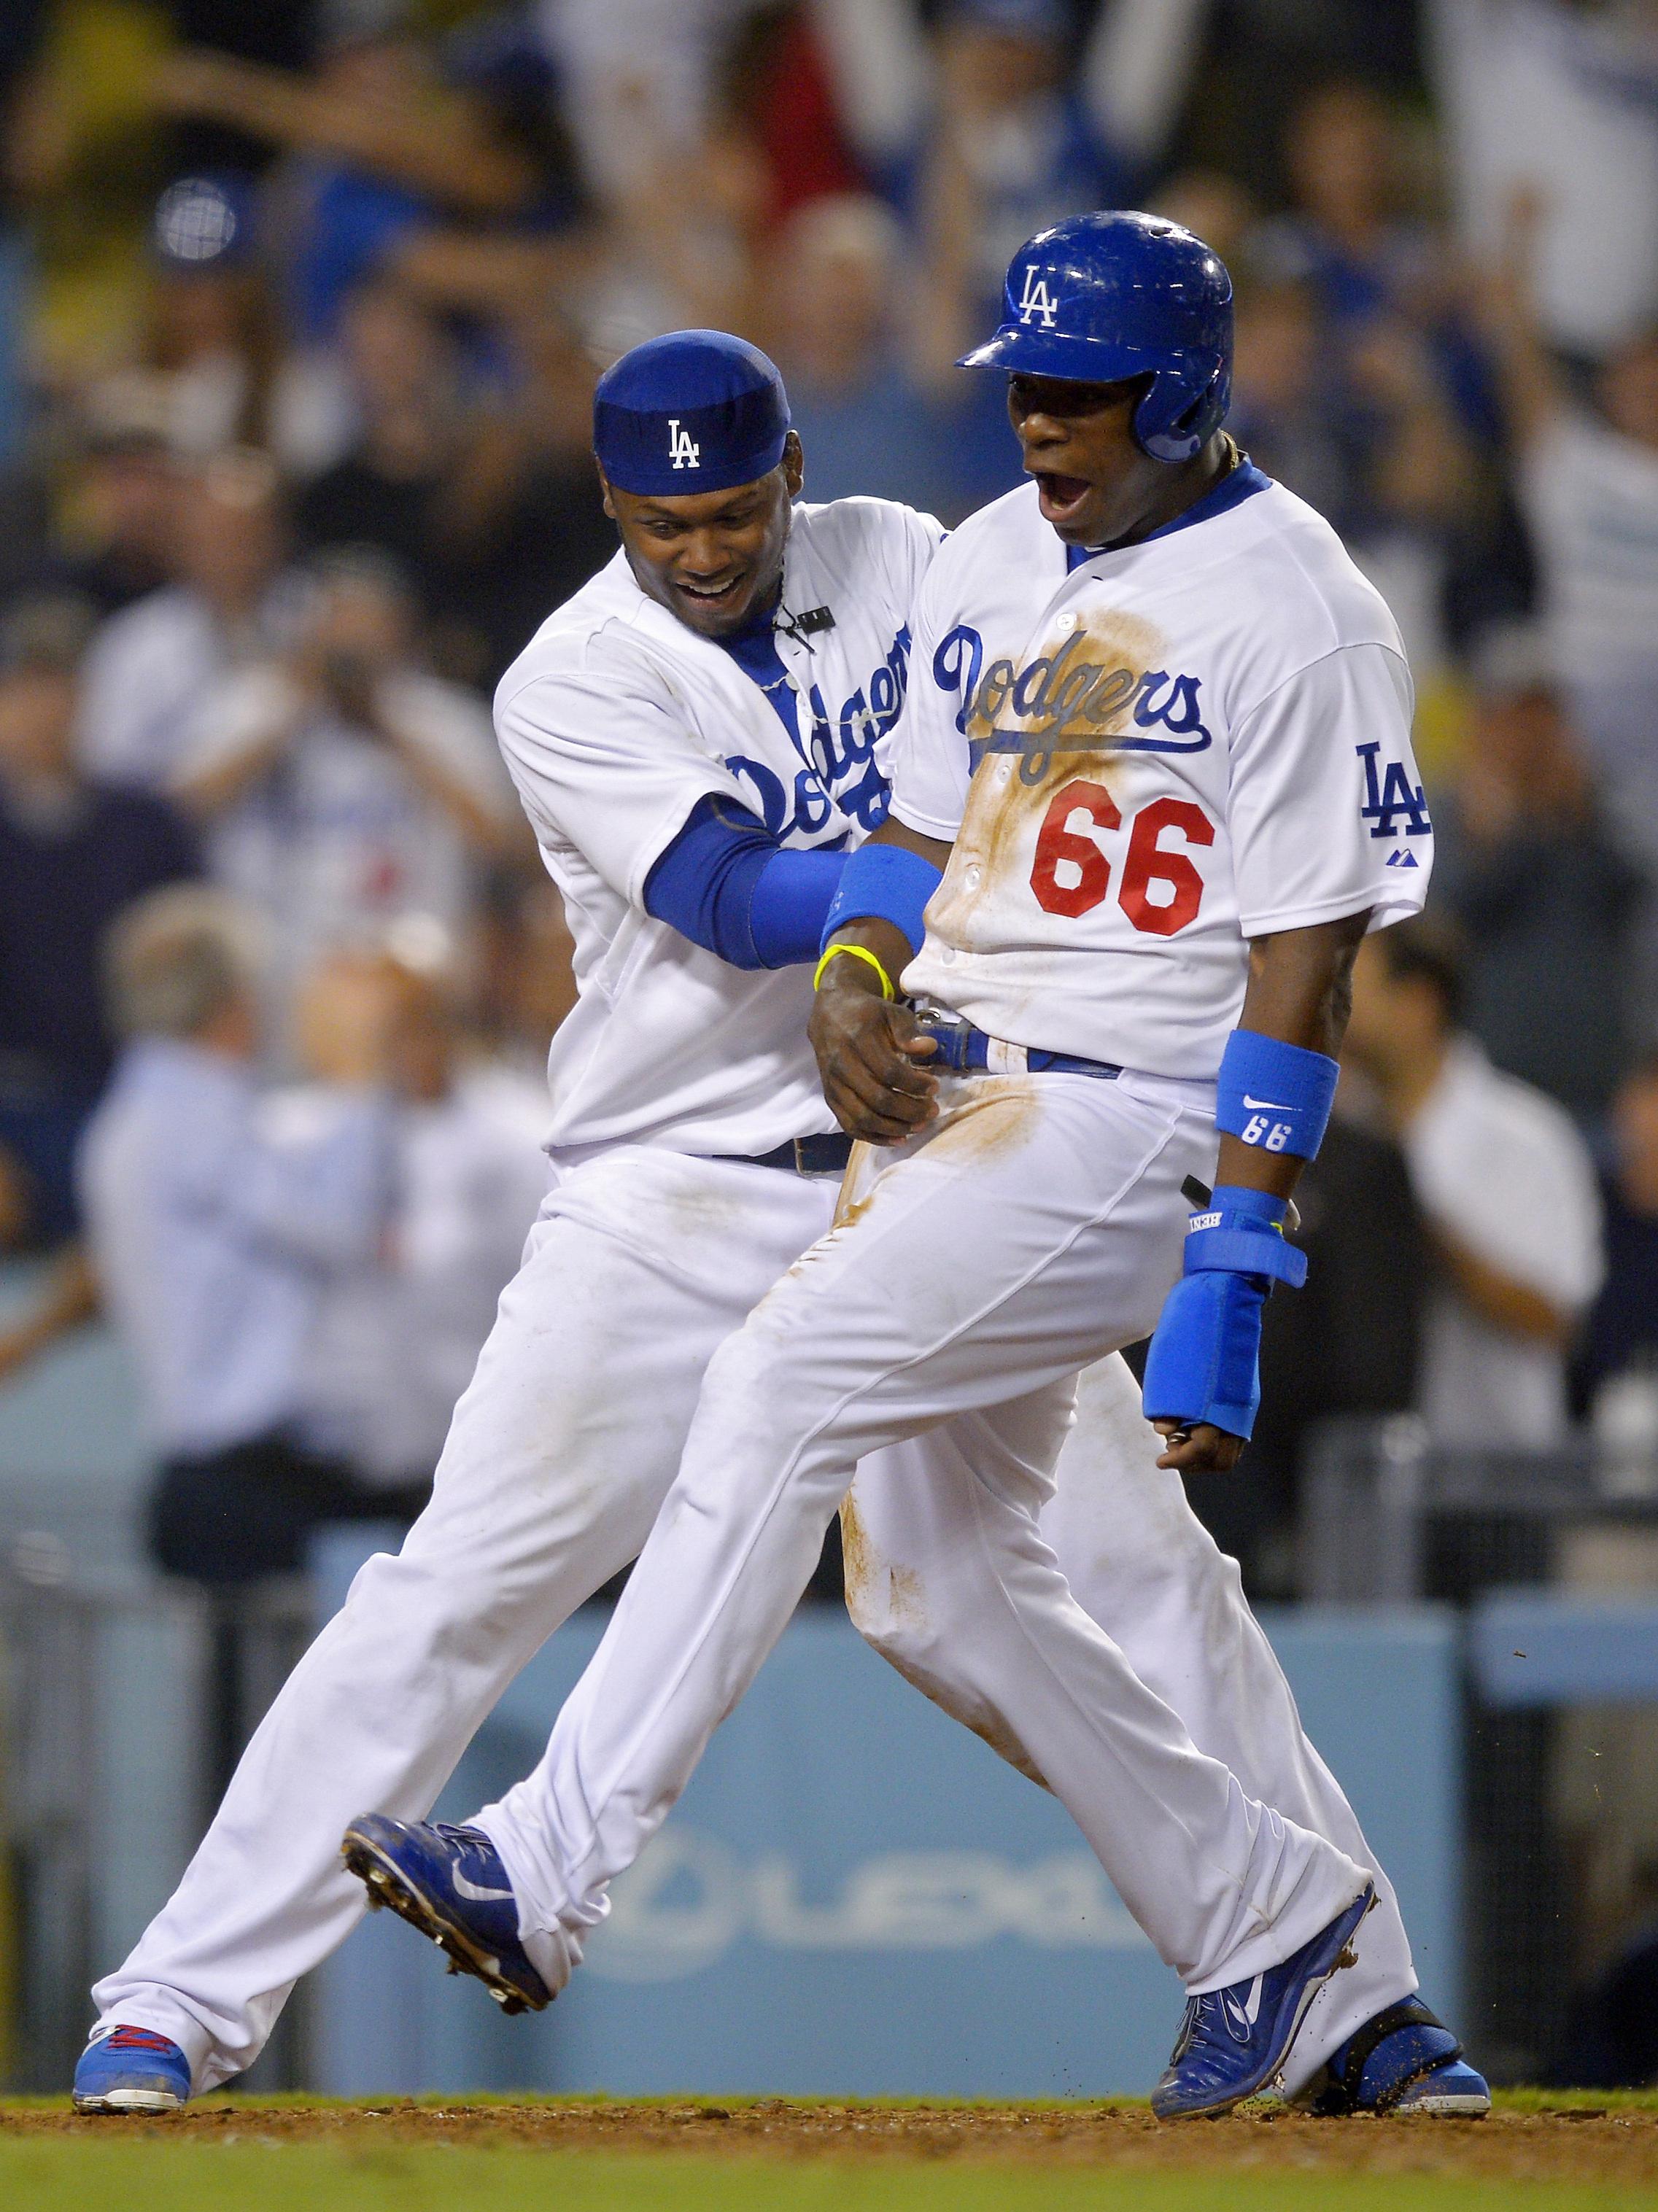 Baseball's Demographic Shifts Bring Cultural Complexities